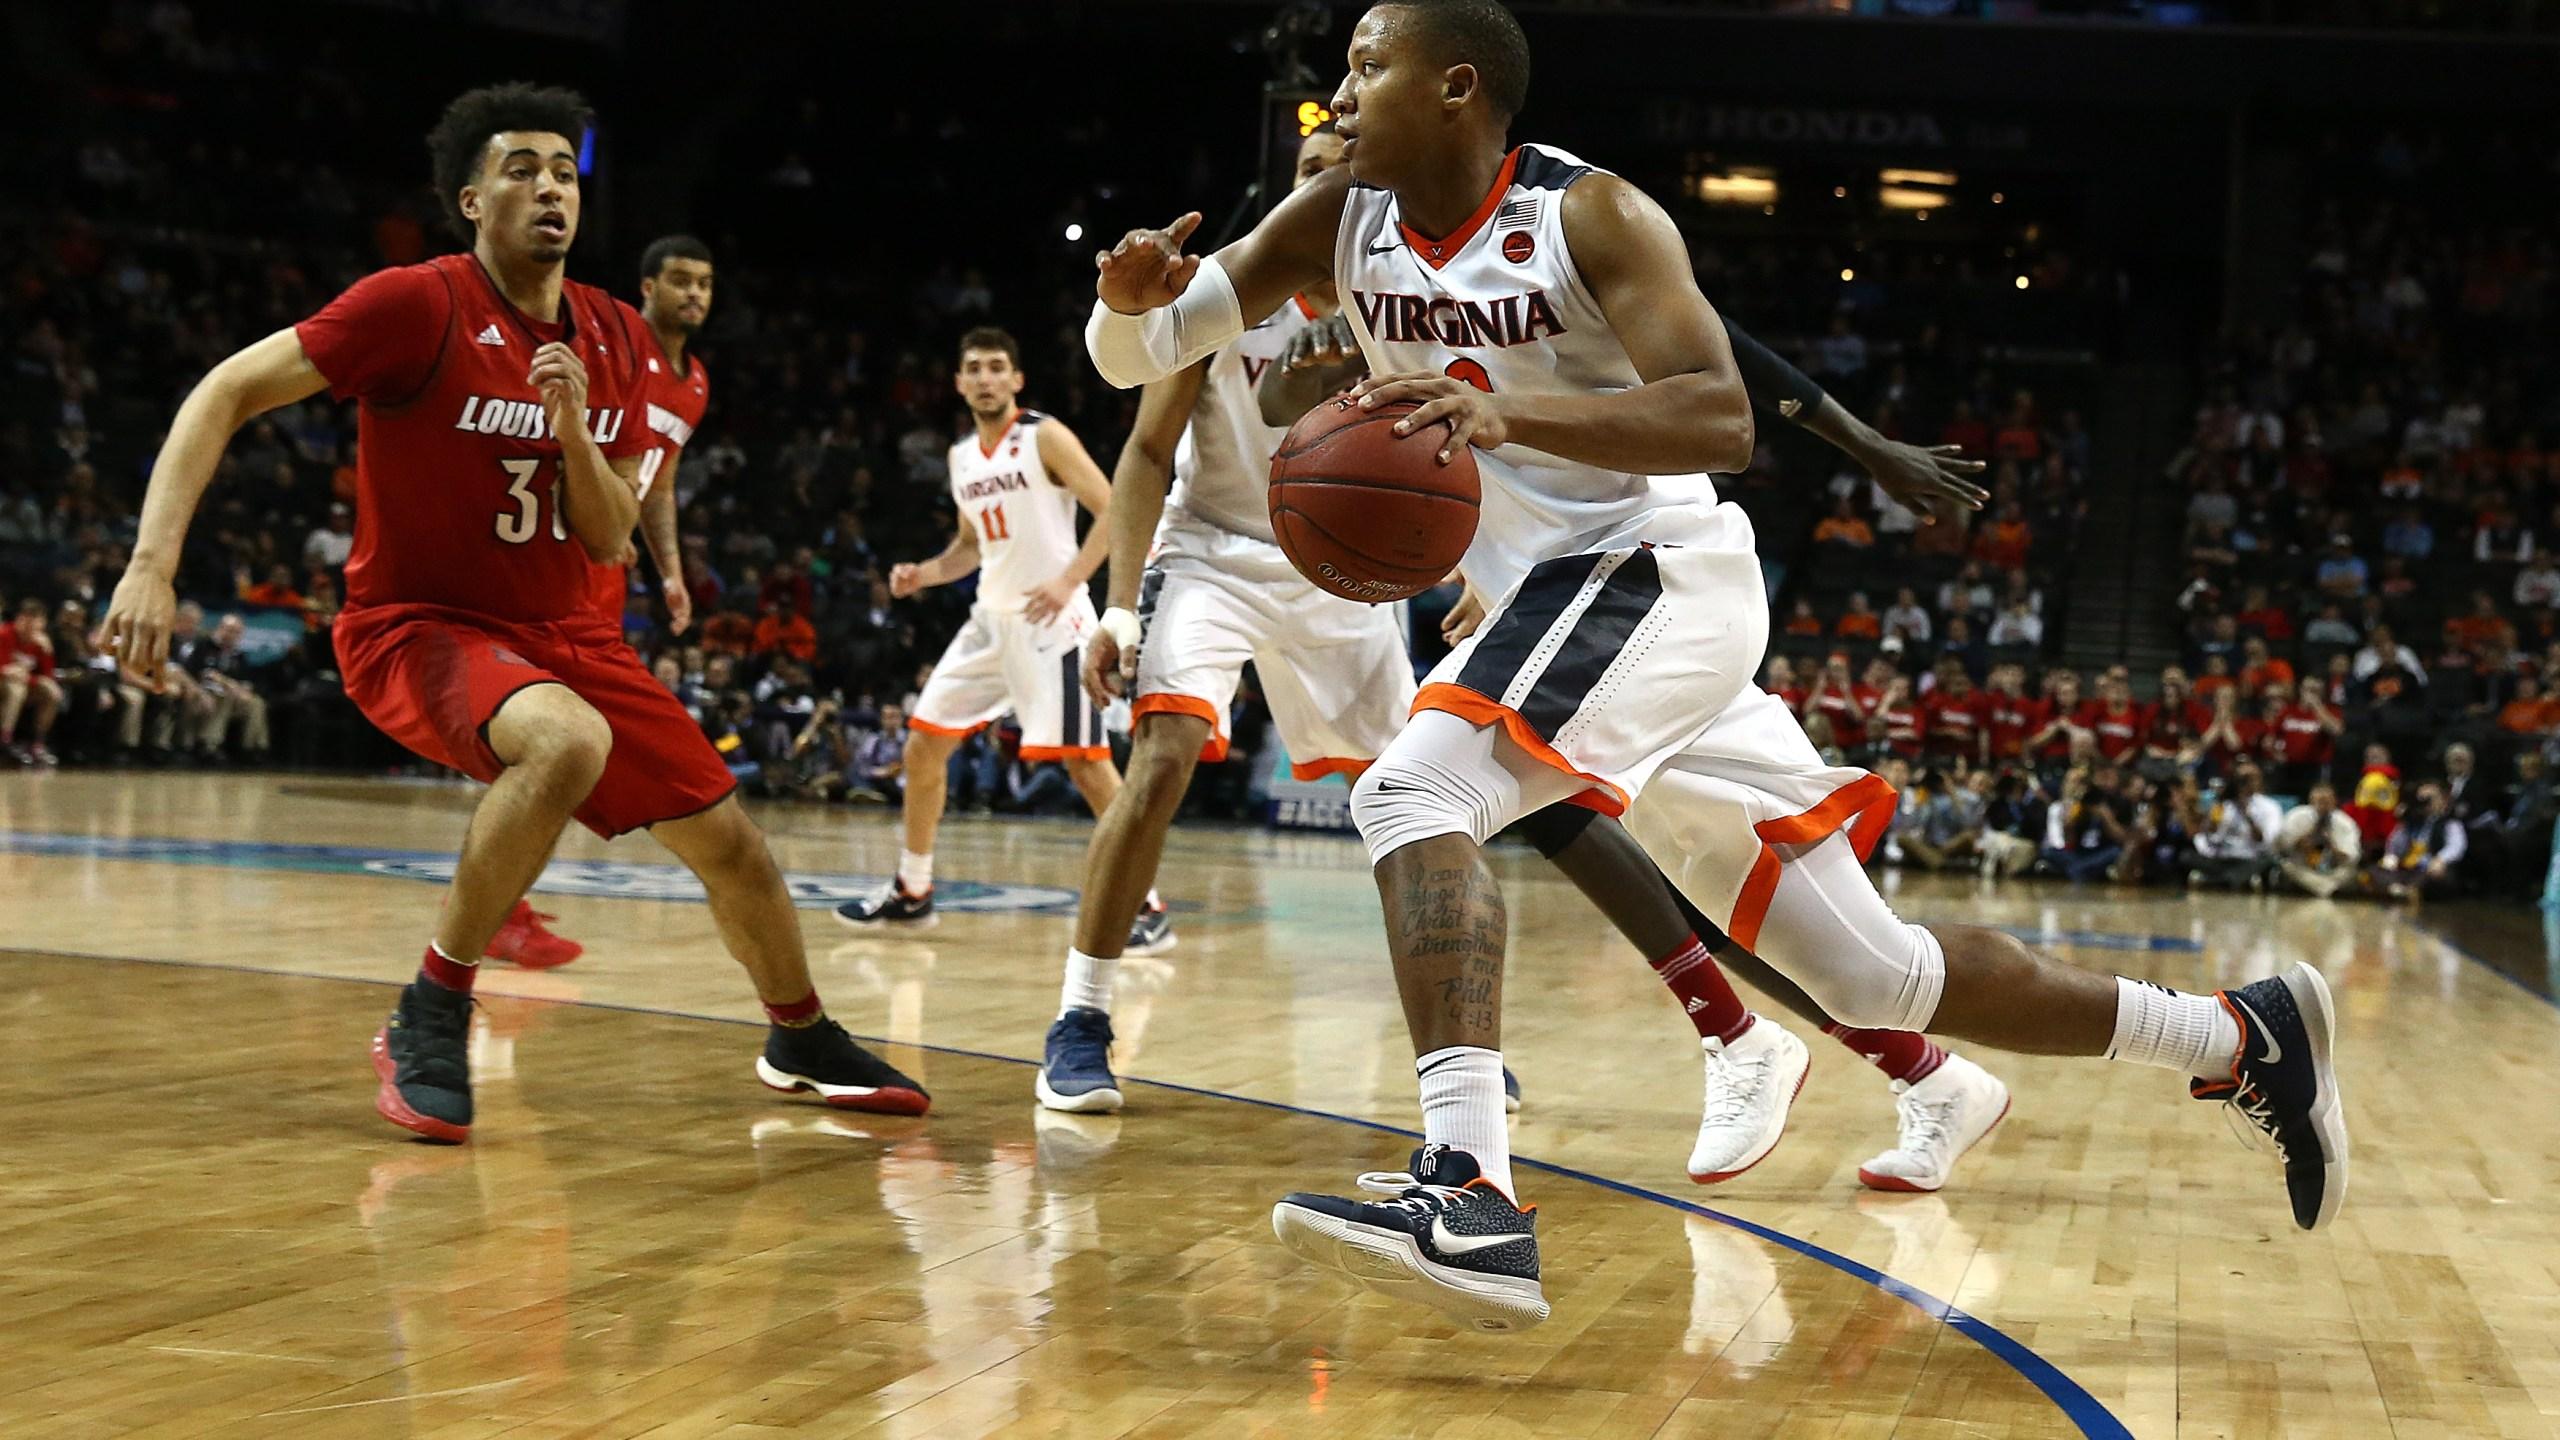 ACC Basketball Tournament - Quarterfinals Va v Louisville_713099